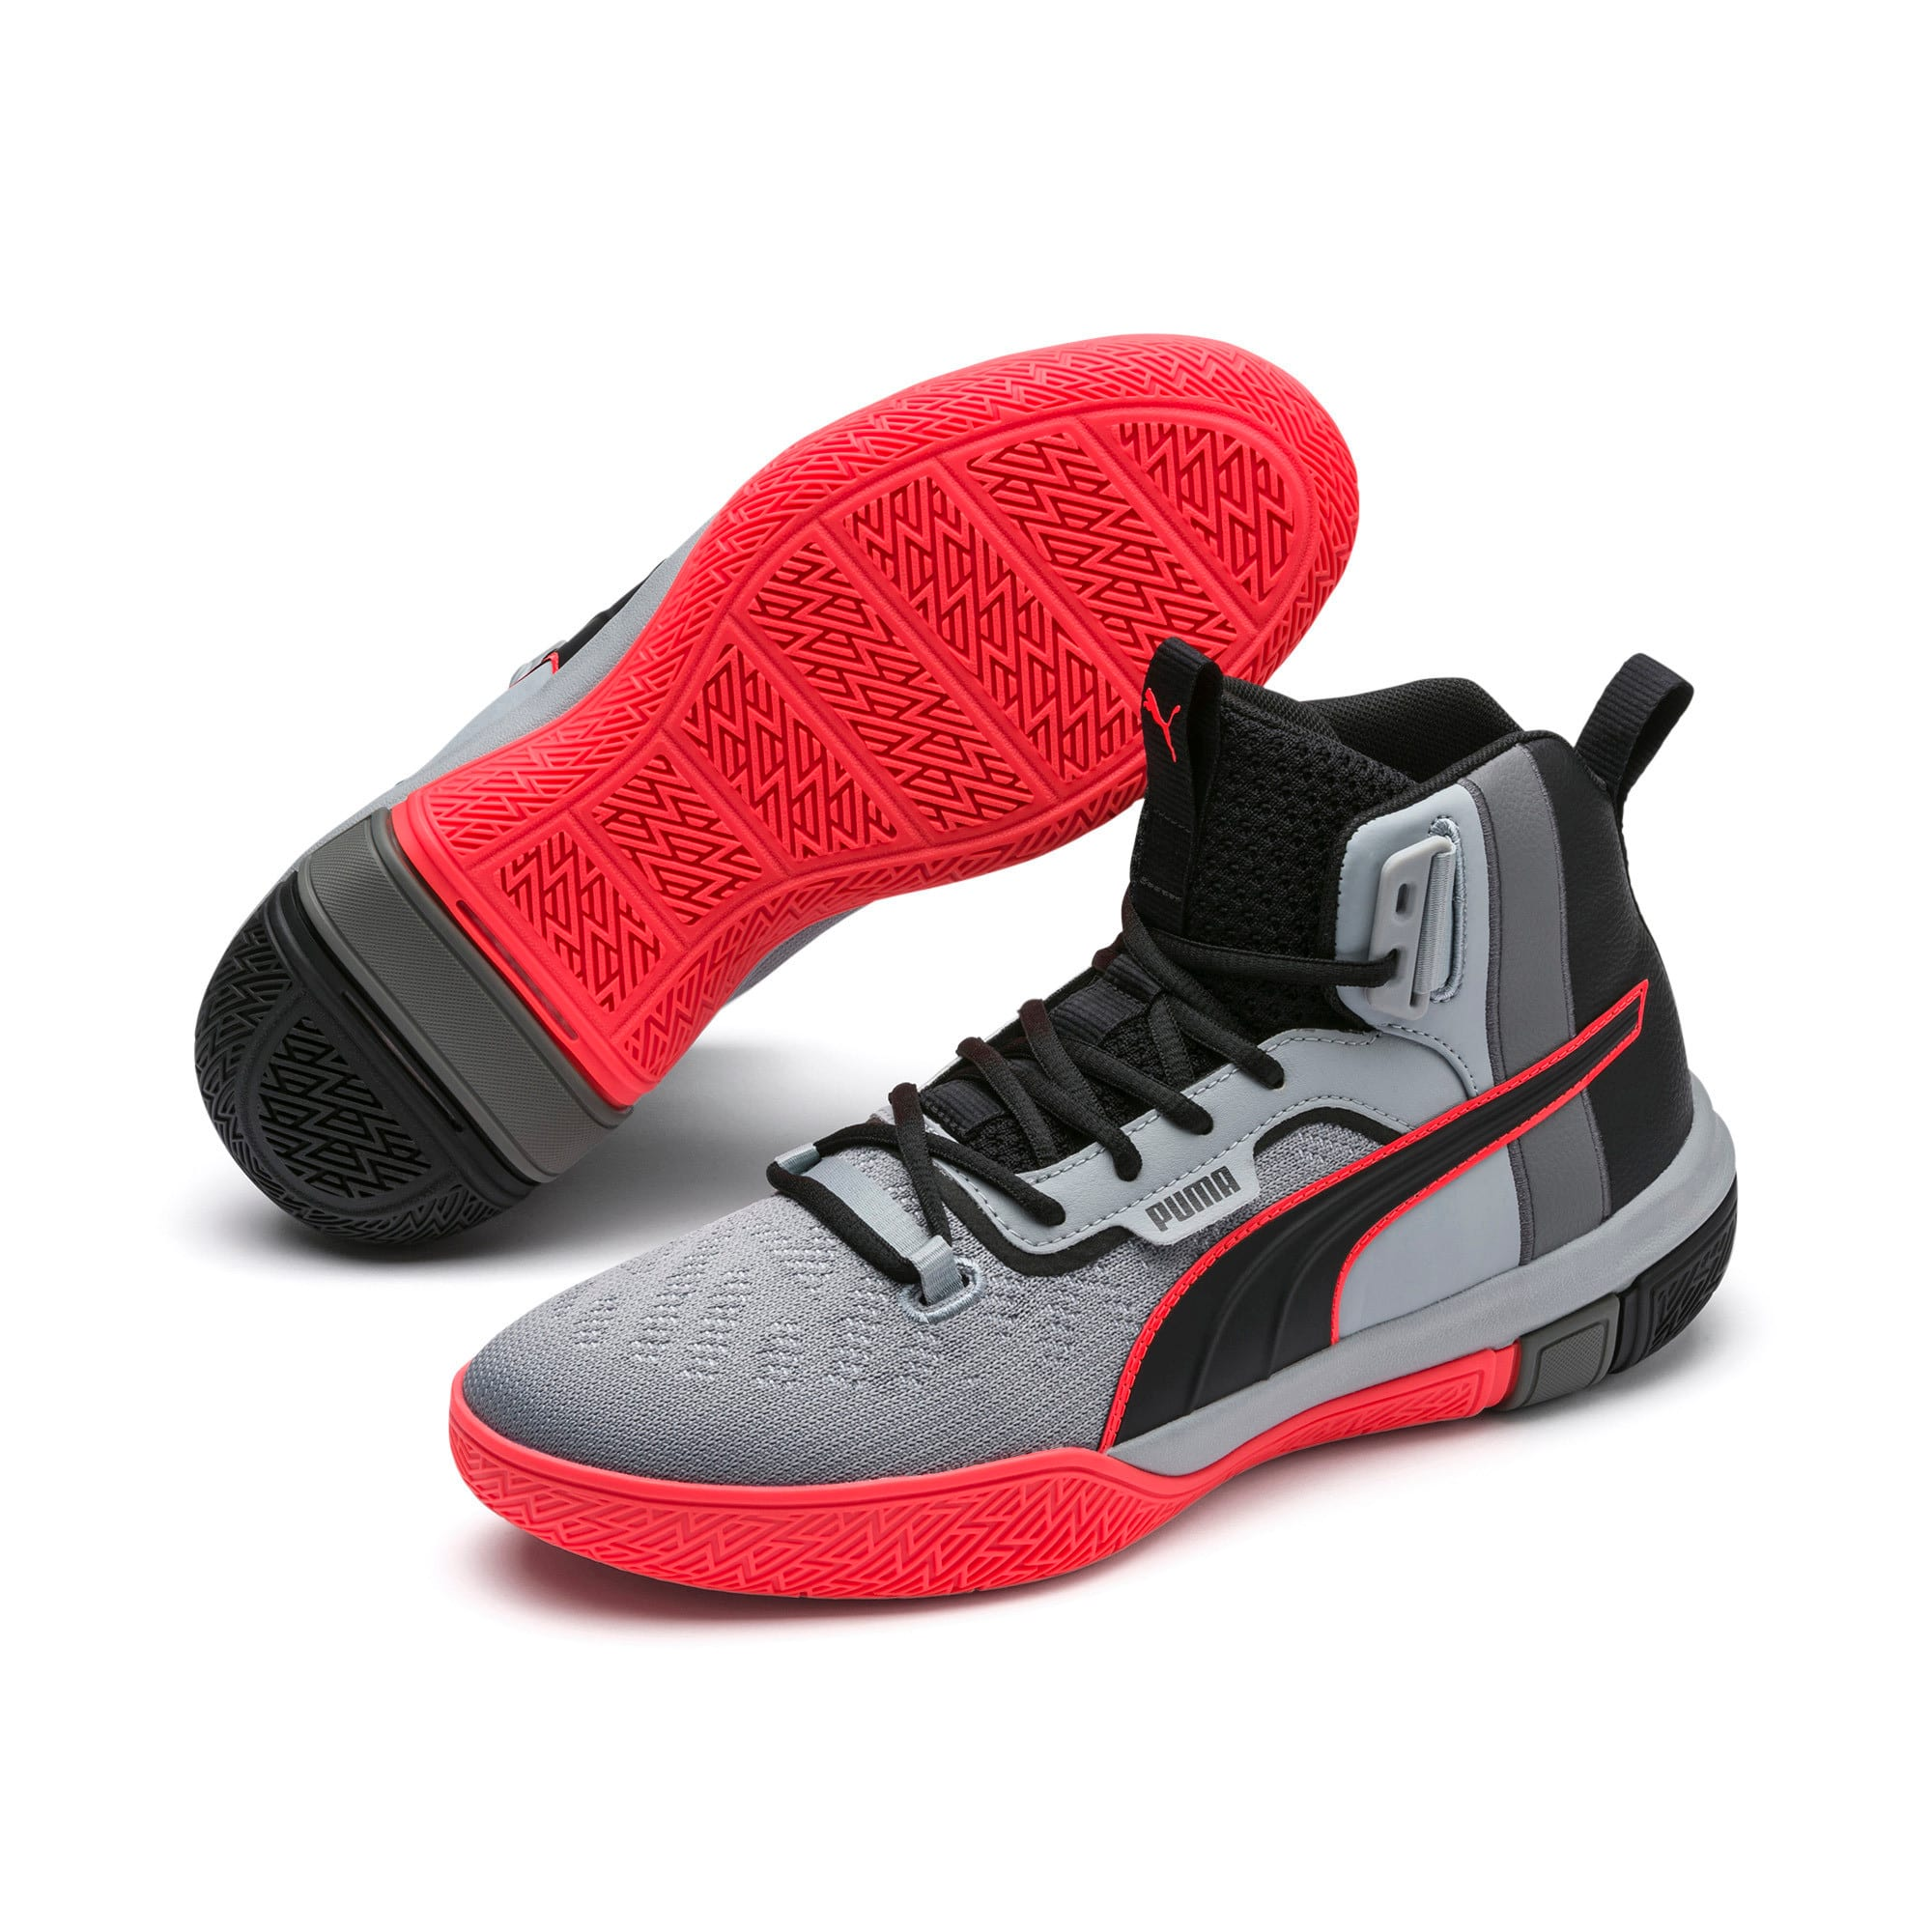 Thumbnail 2 of Legacy Disrupt Men's Basketball Shoes, Puma Black-Red Blast, medium